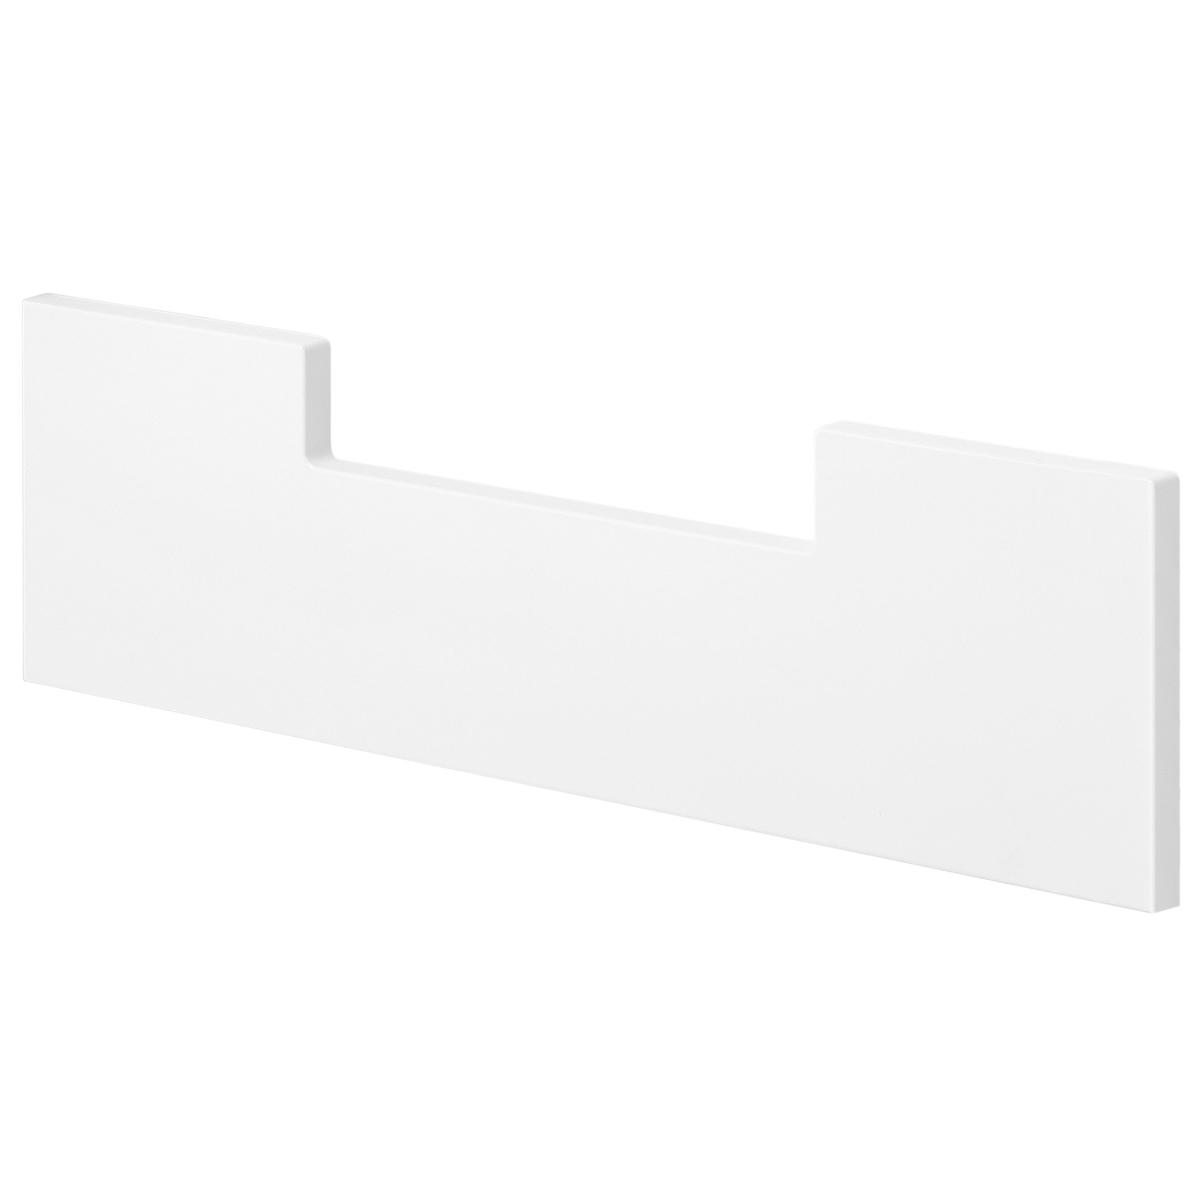 Barrera seguridad cuna 60x120cm Lifetime blanco